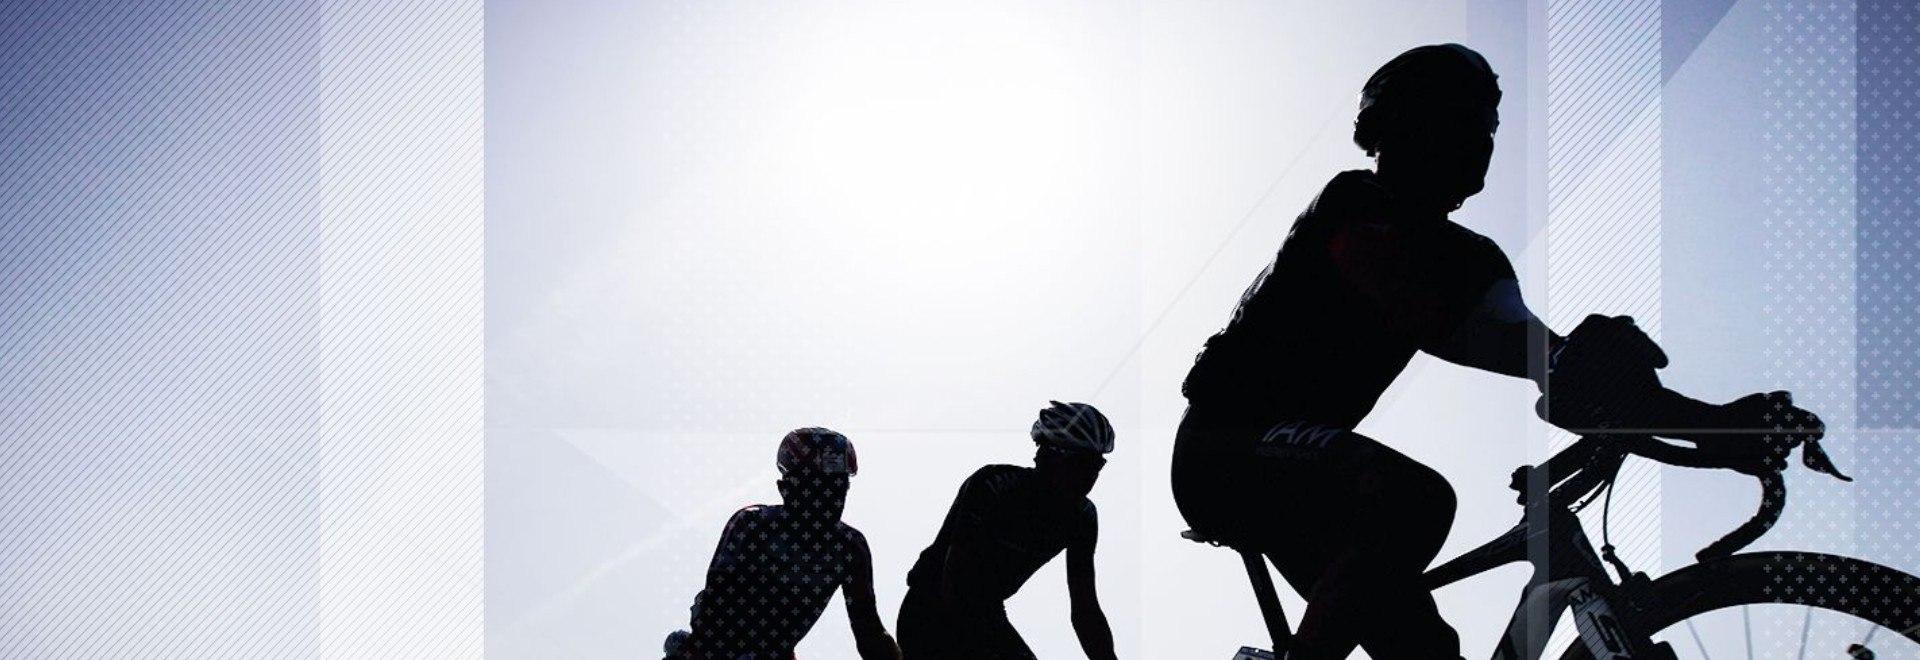 21a tappa, Senago - Milano (29.4 km crono)